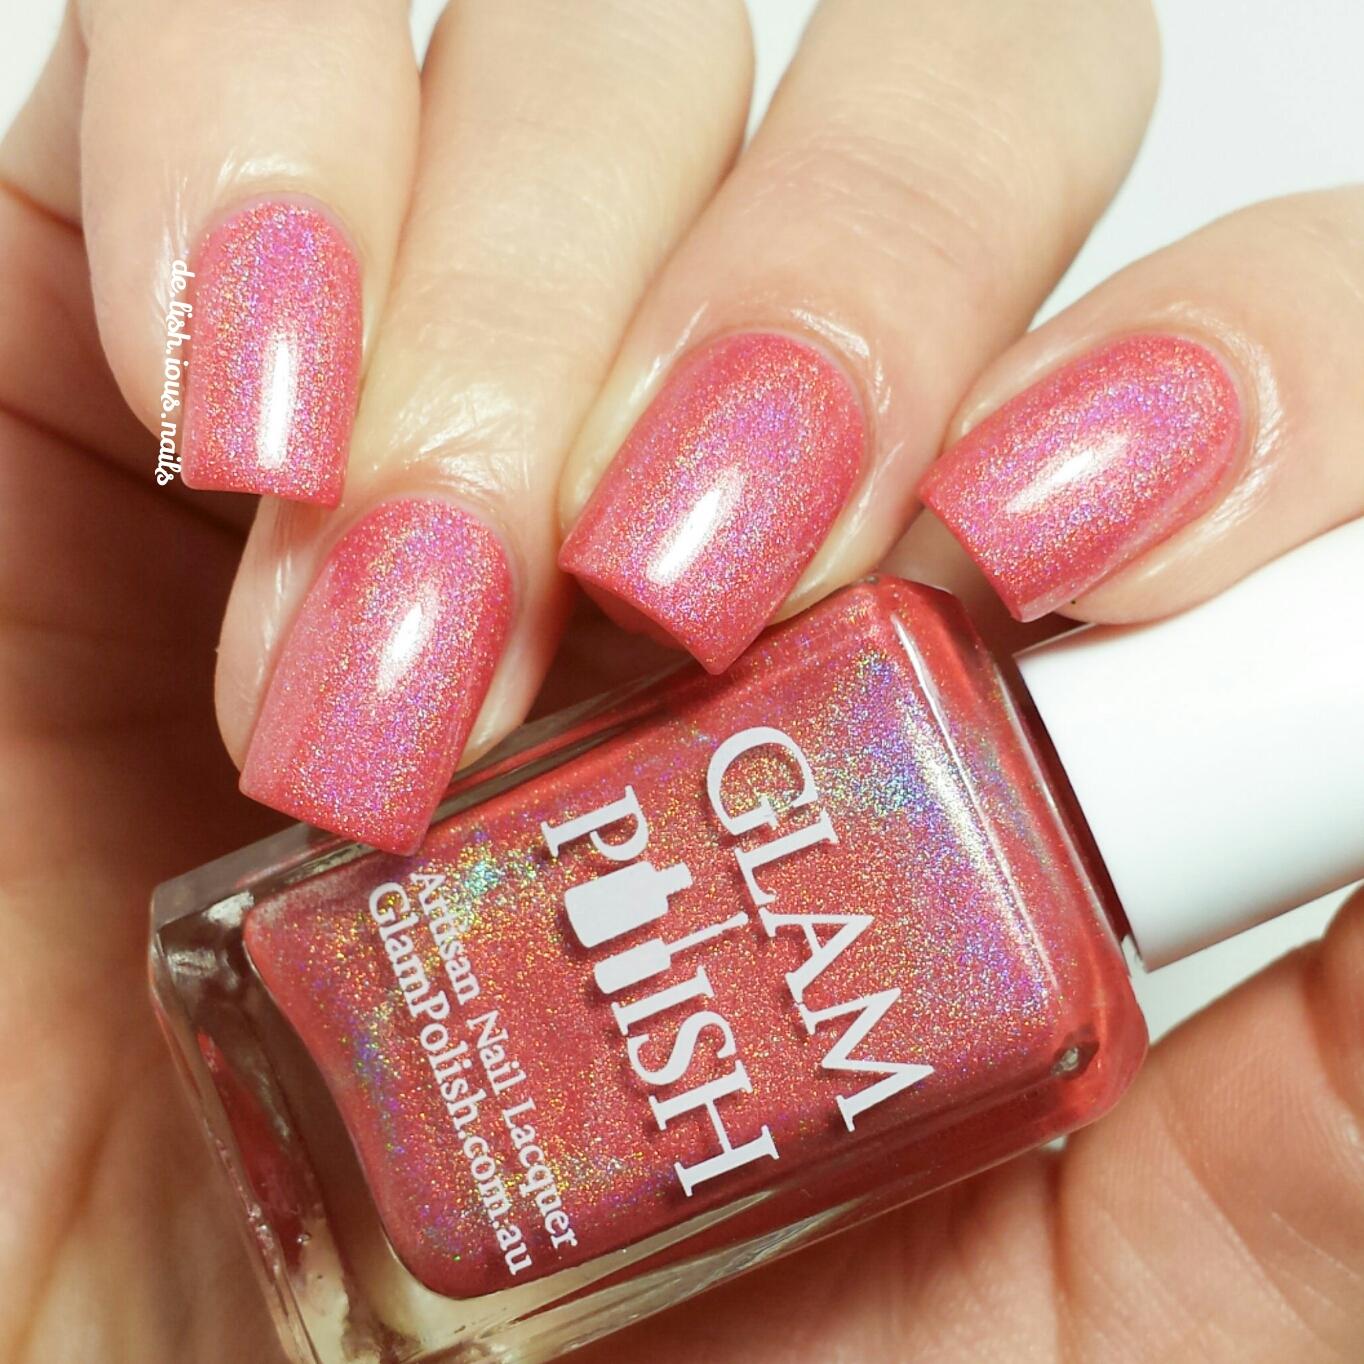 glam-polish-can-you-please-spell-gabbana-3.jpg.jpeg